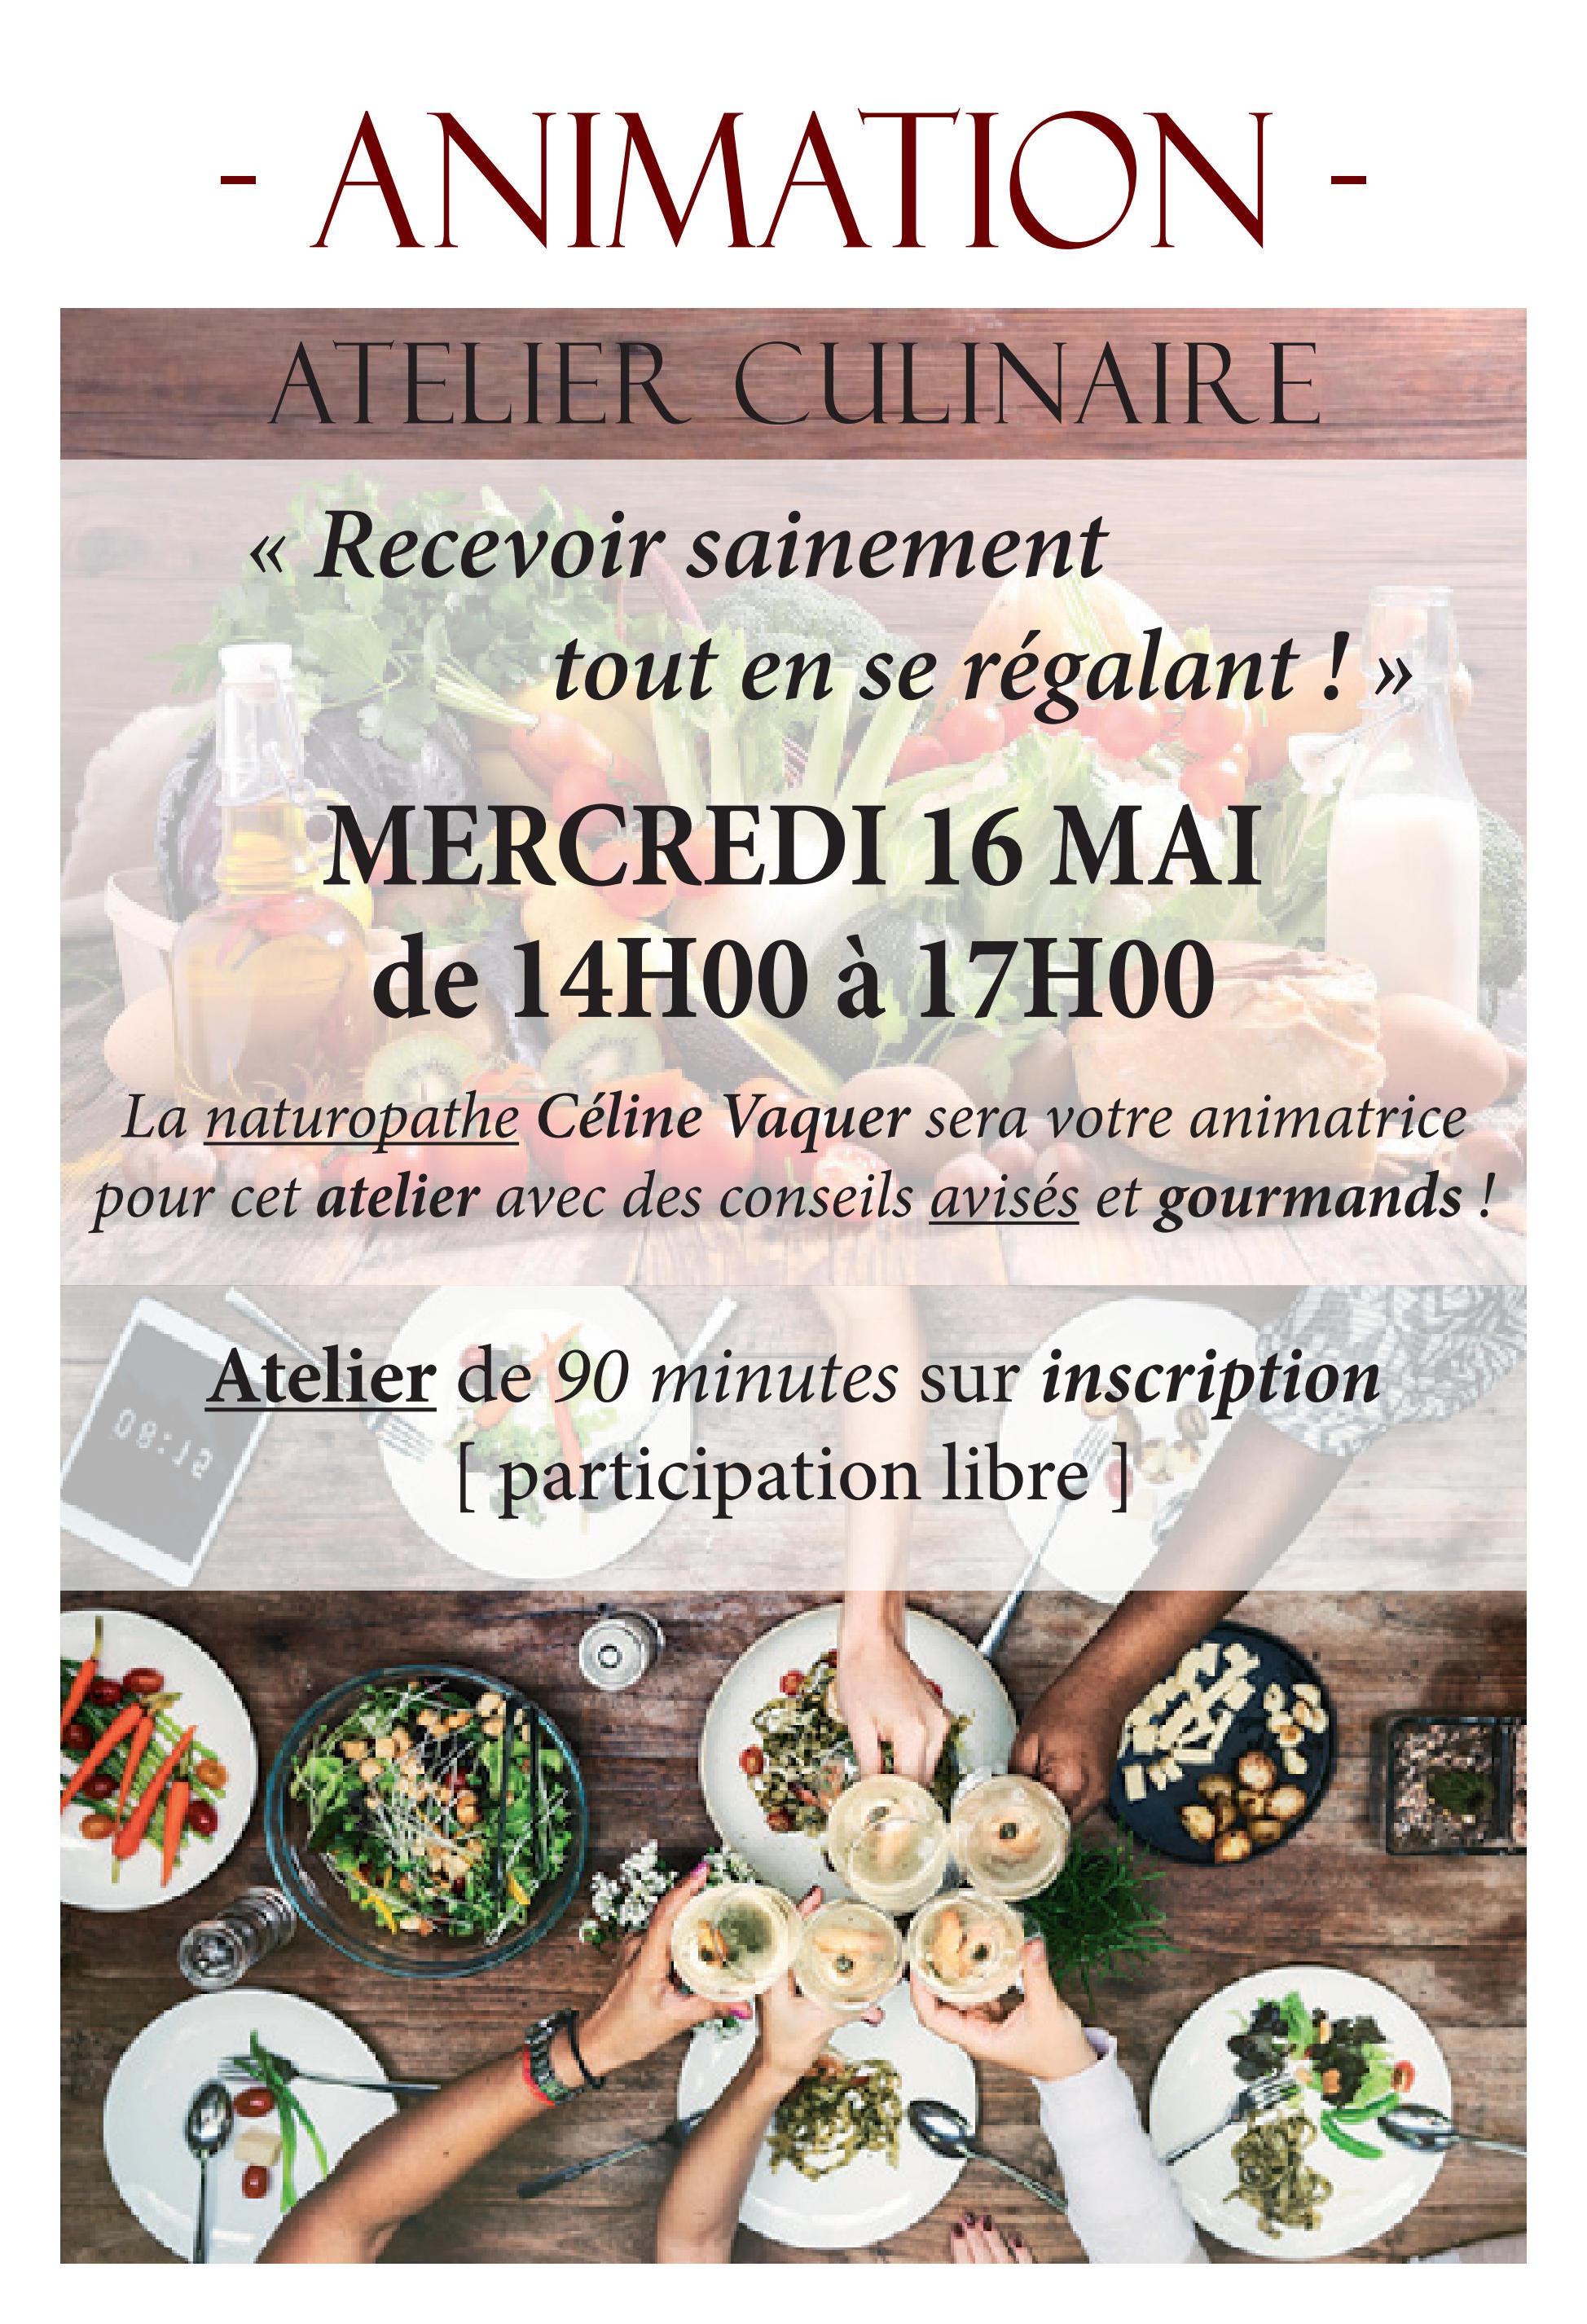 affiche_atelier_culinaire_celine_vaquer_bio_chrysalide_montelimar_mai_2018.jpg